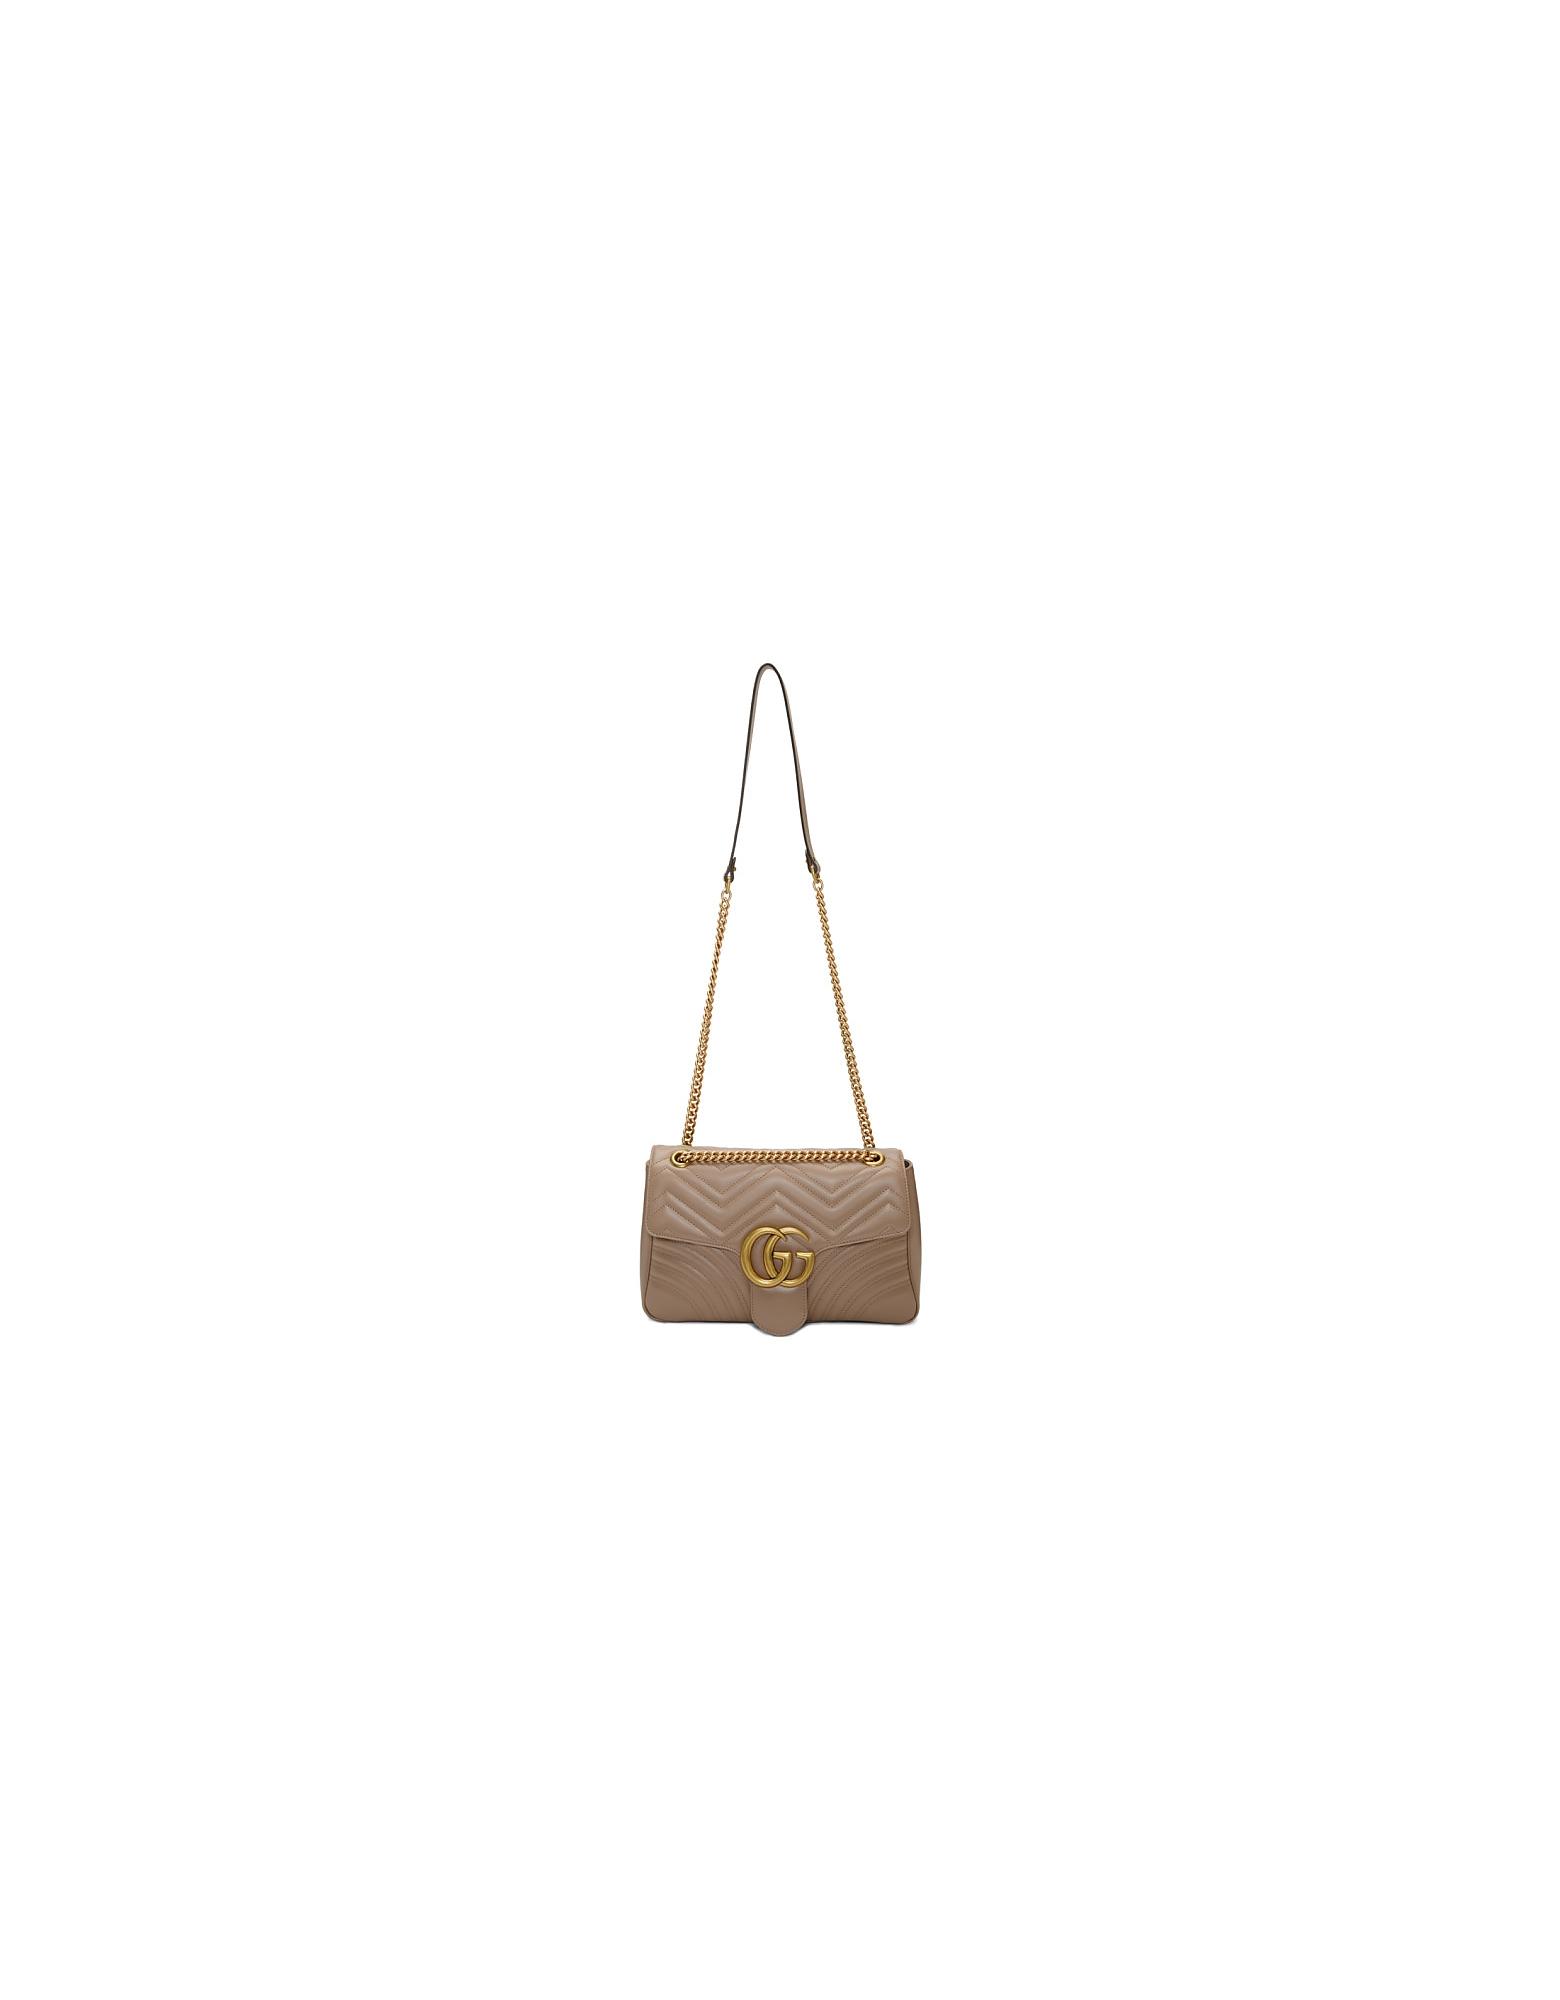 Gucci Designer Handbags, Pink Medium GG Marmont 2.0 Shoulder Bag